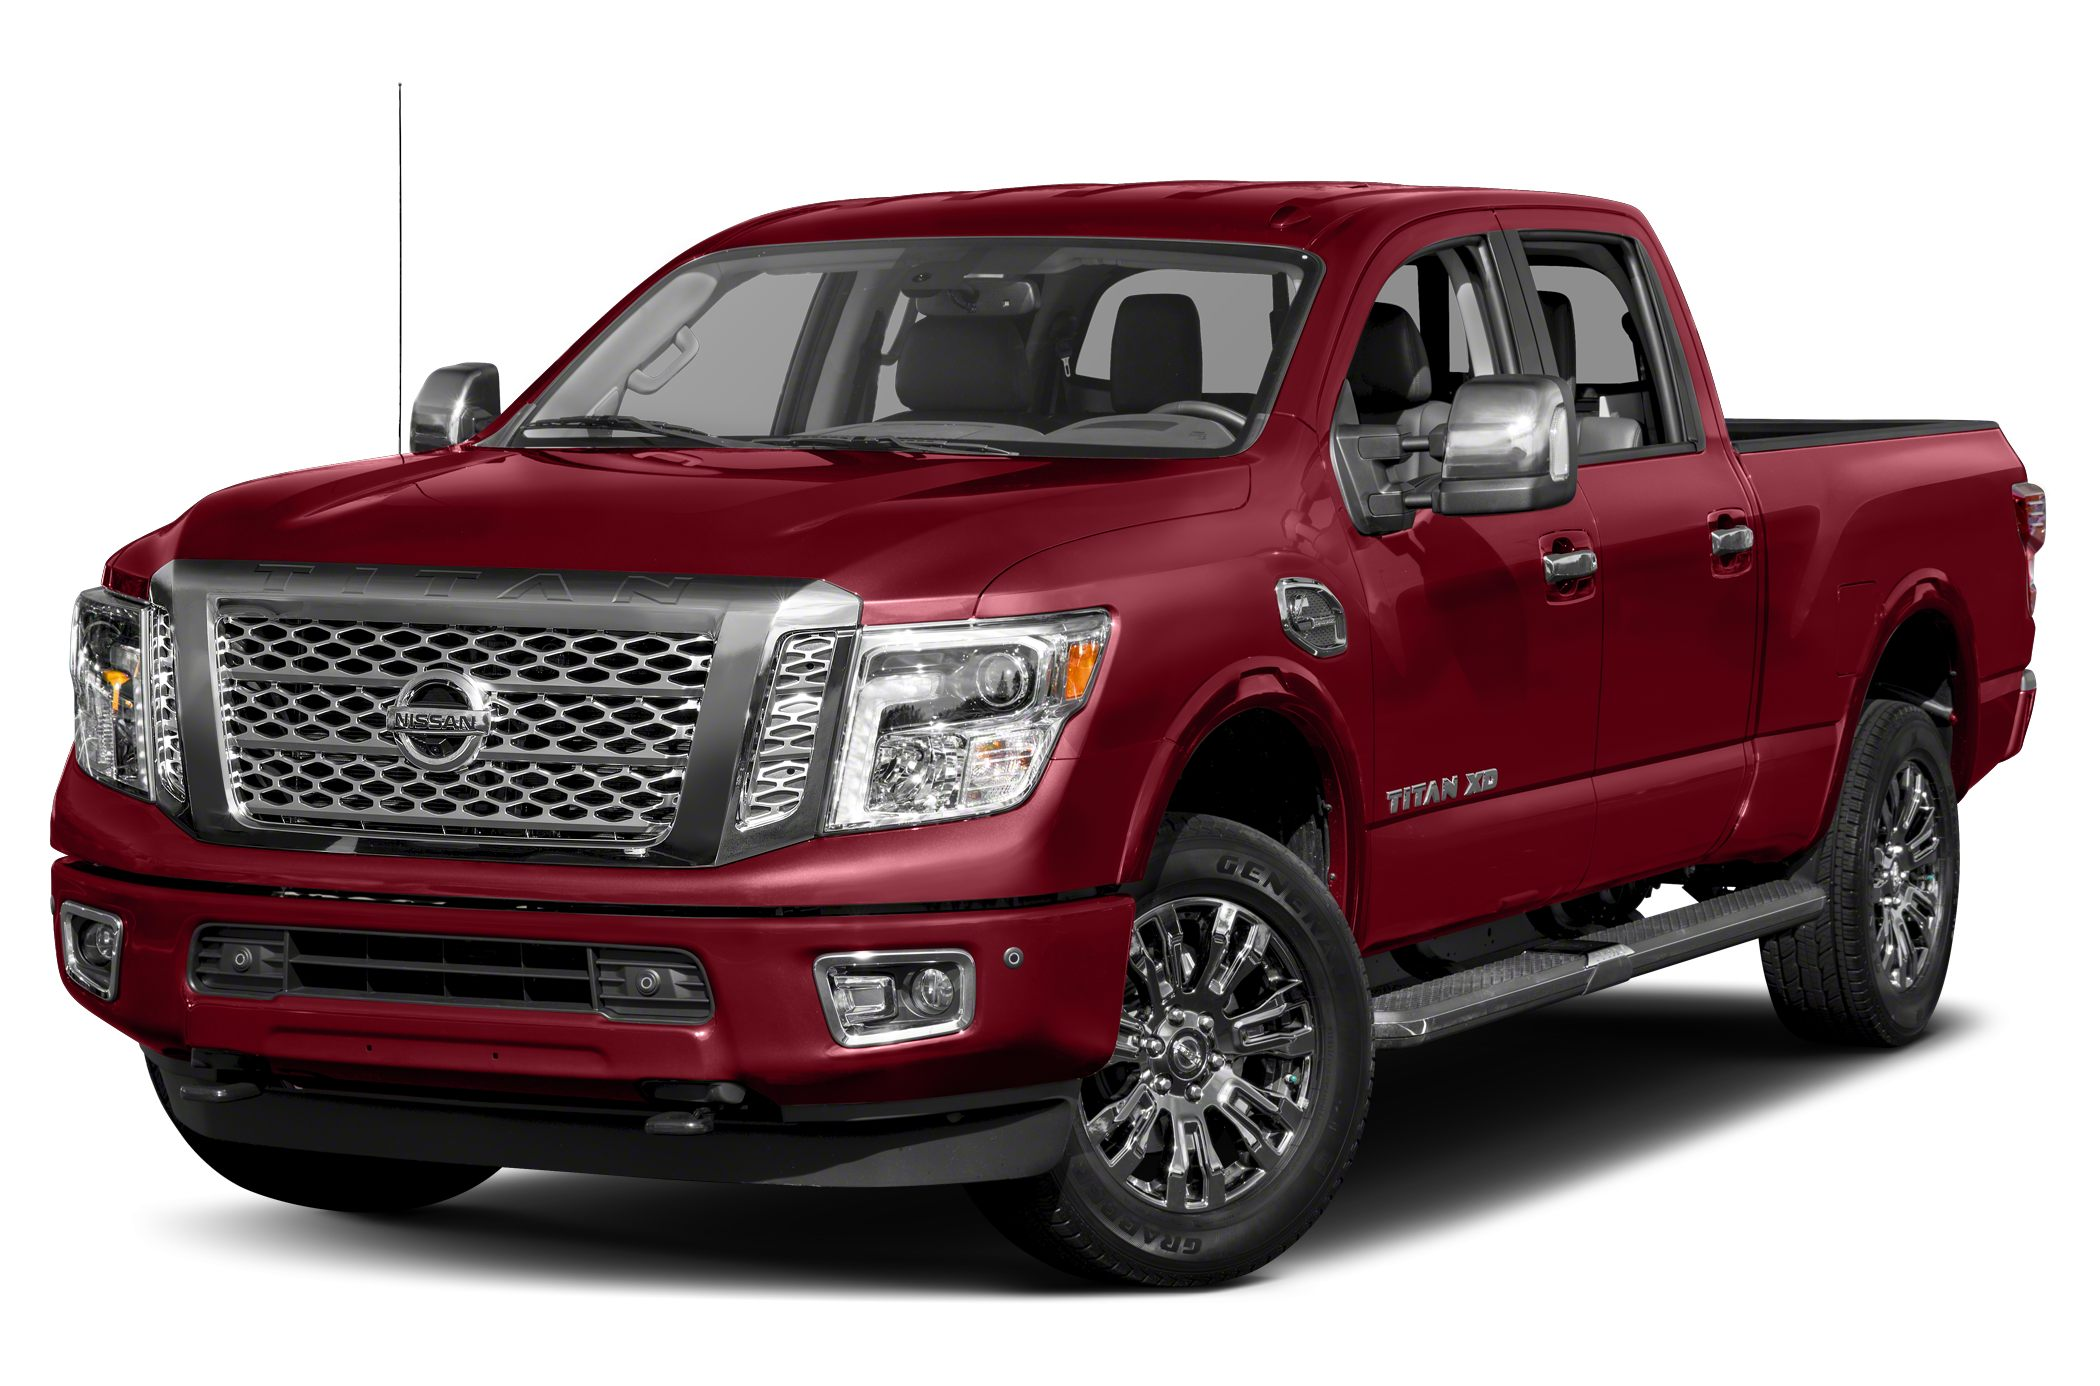 2016 Nissan Titan Xd Platinum Reserve Diesel 4dr 4x4 Crew Cab 151 6 In Wb Pictures